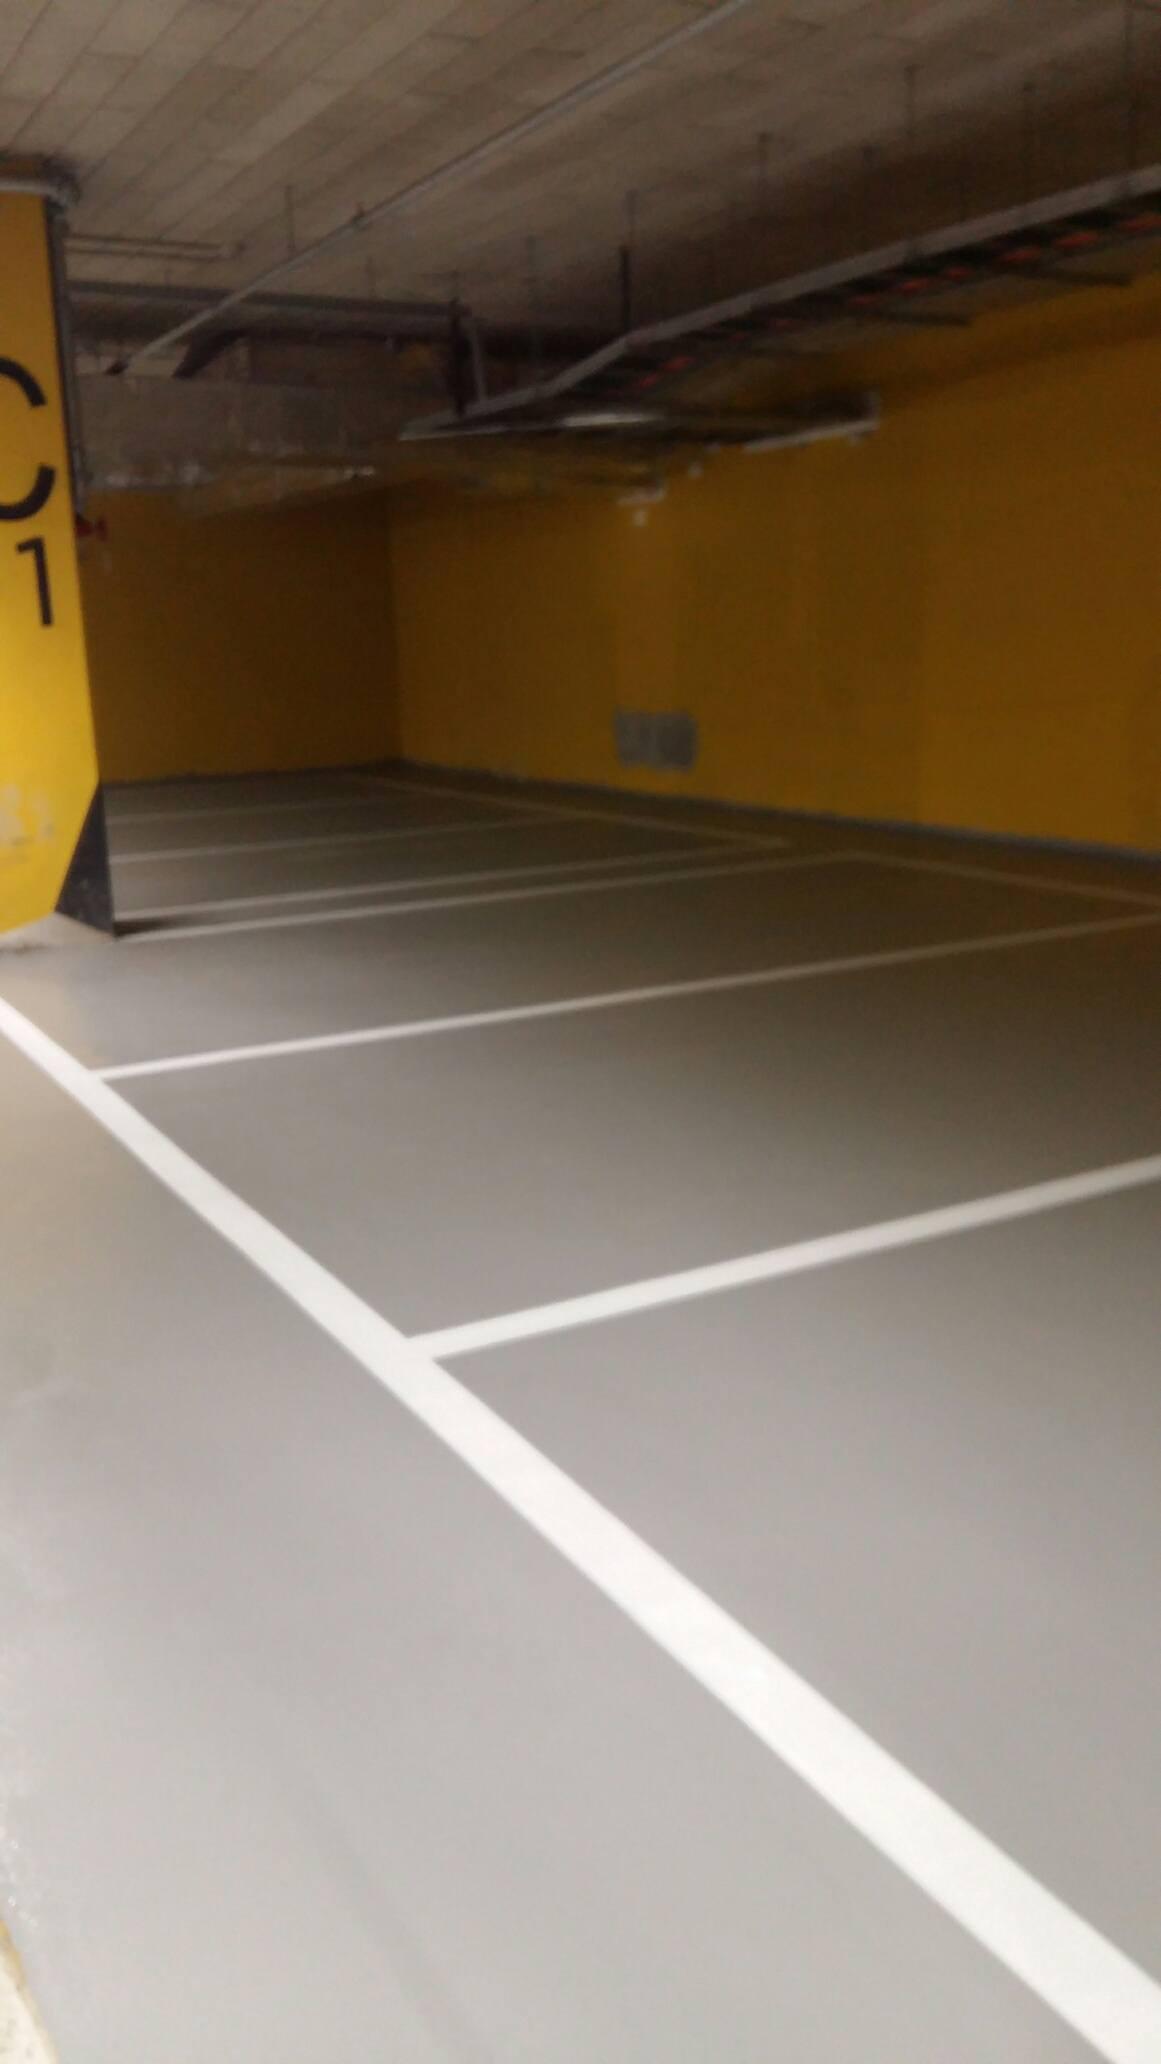 Pardoseala parcare subterana aplicata de Nanochem